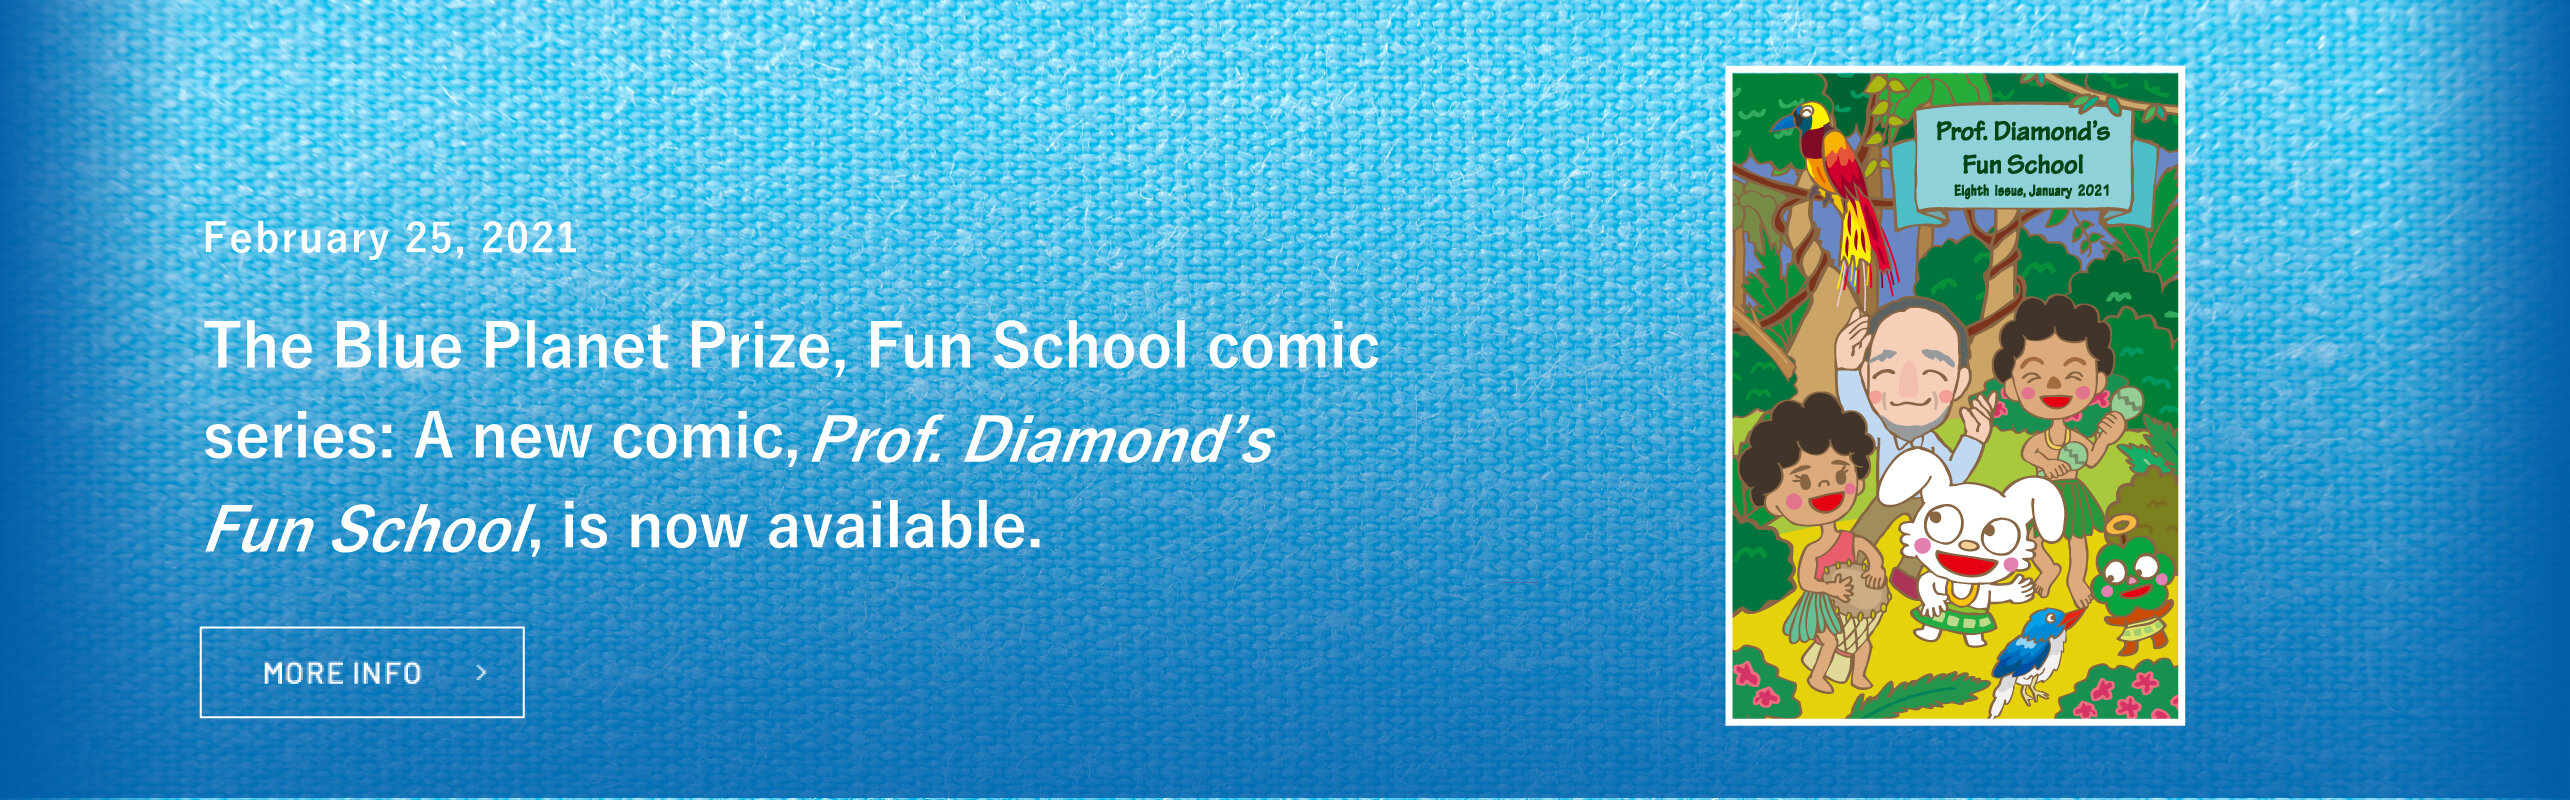 Prof. Diamond's Fun School has been published